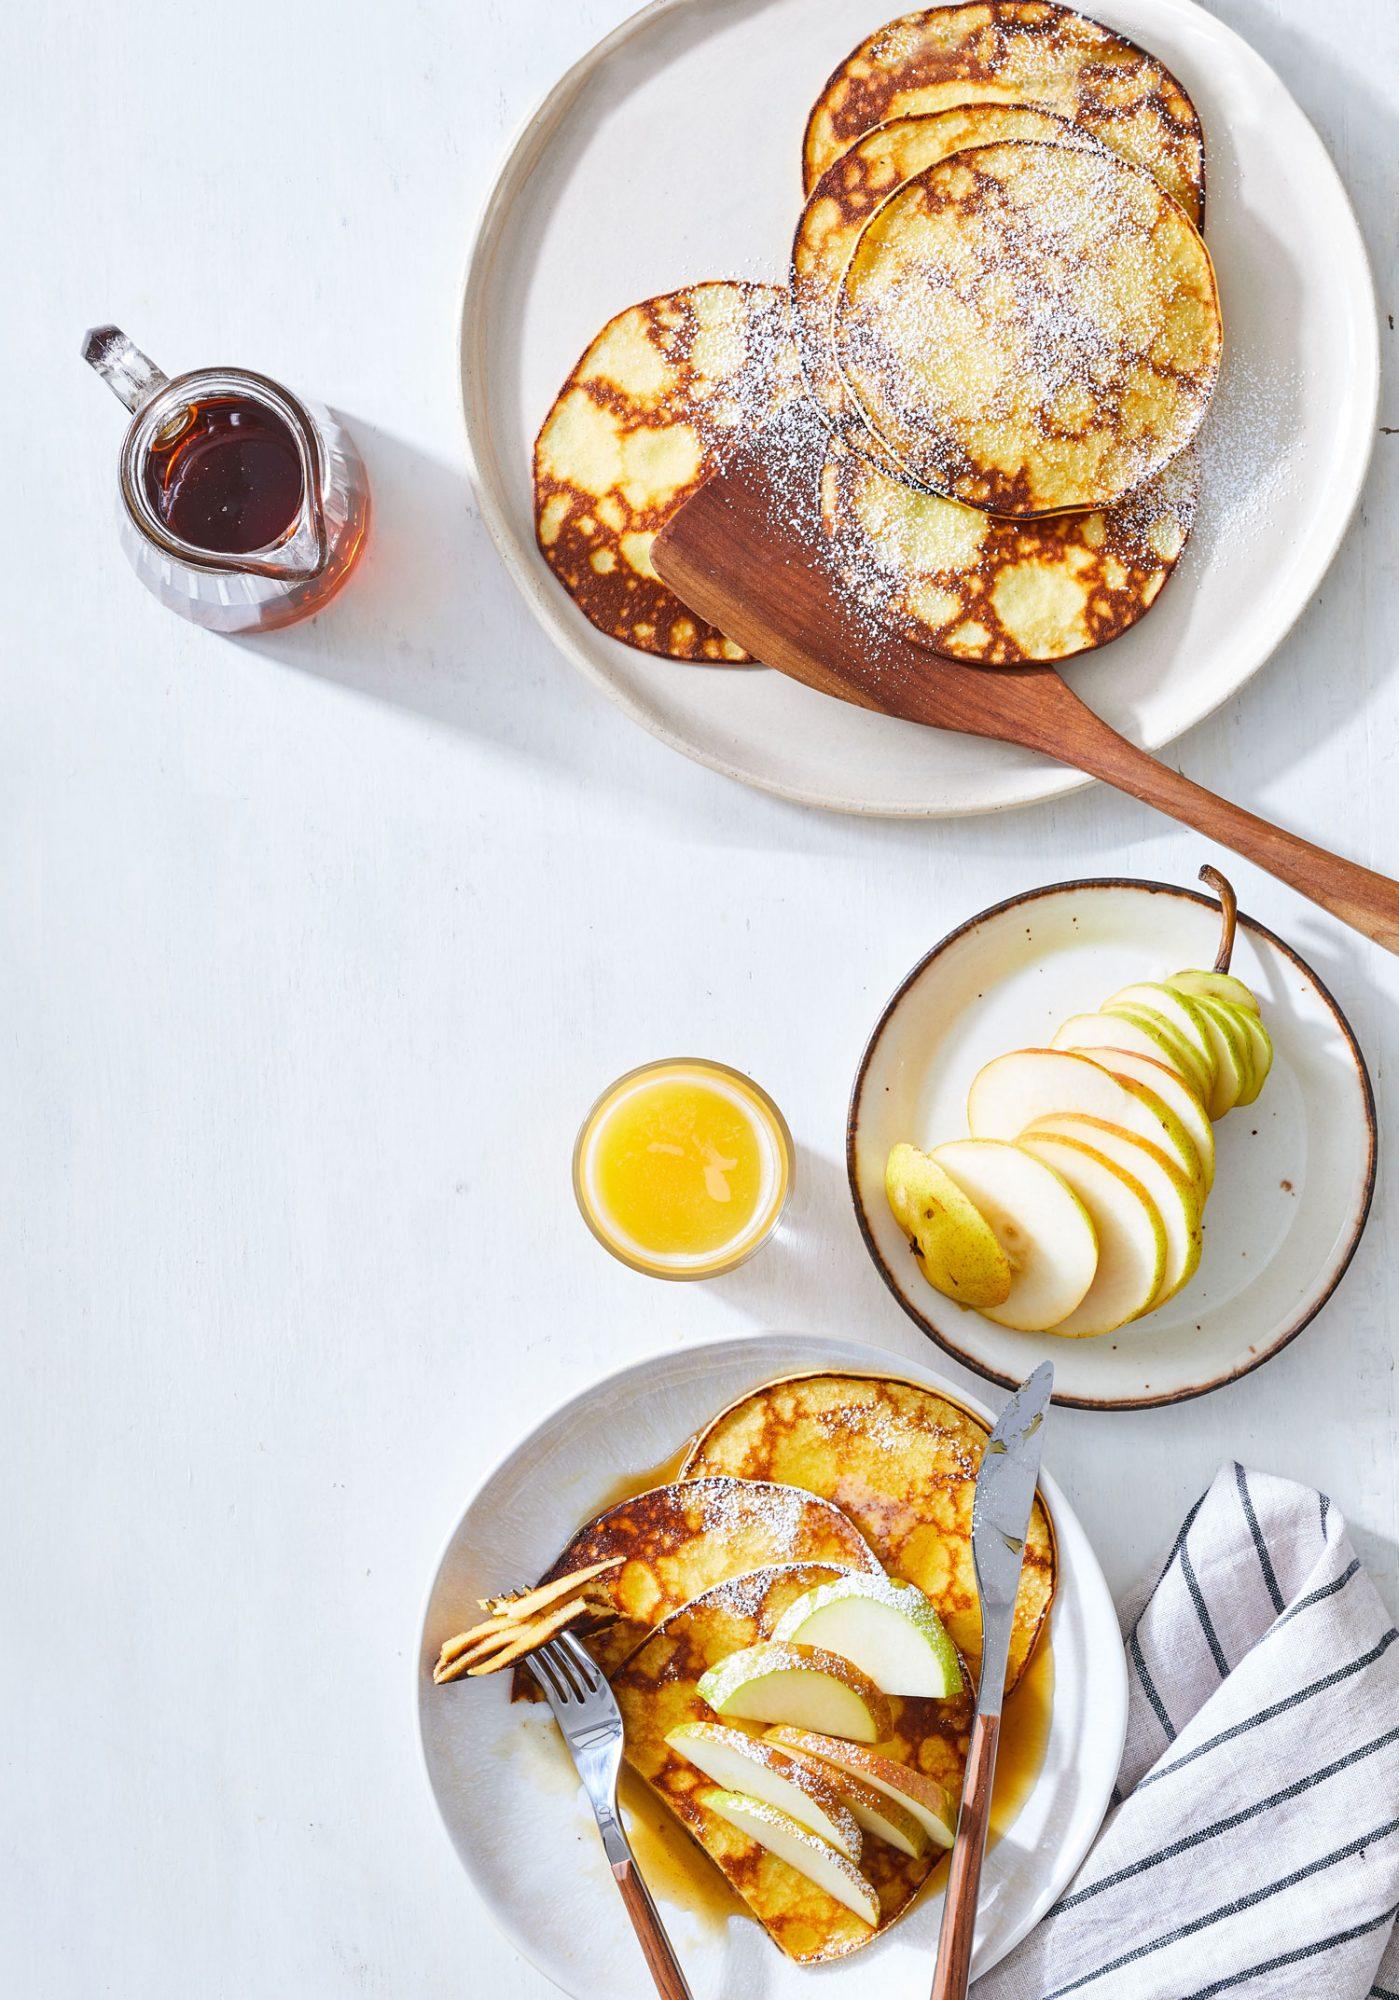 Lemon-Ricotta Hotcakes